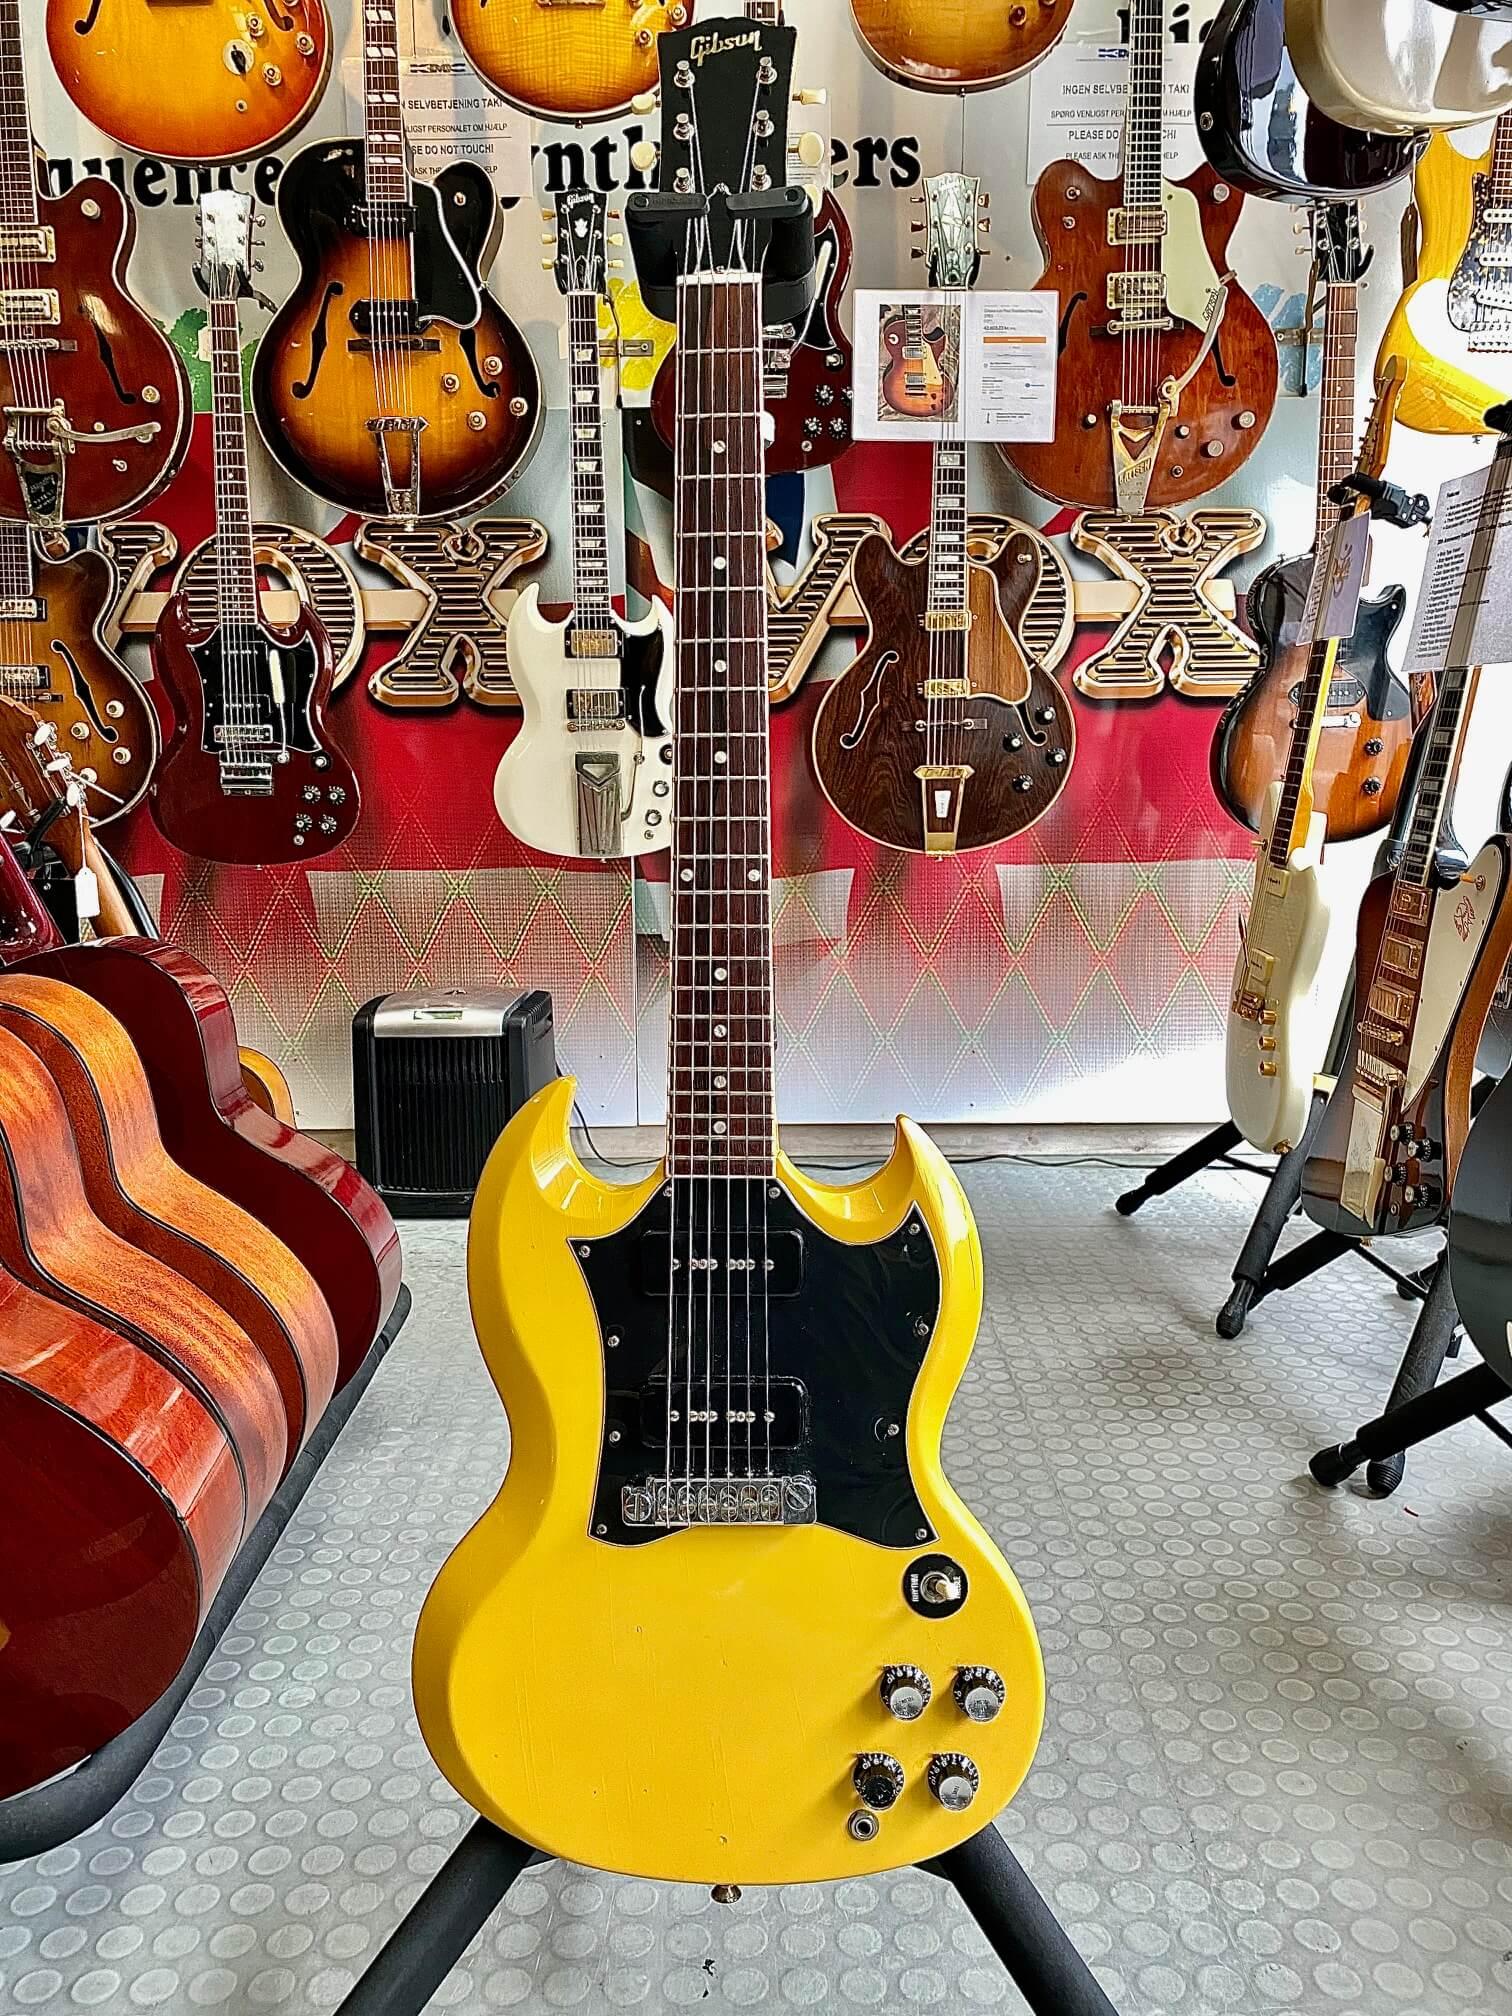 Gibson Les Paul SG TV Yellow 1967